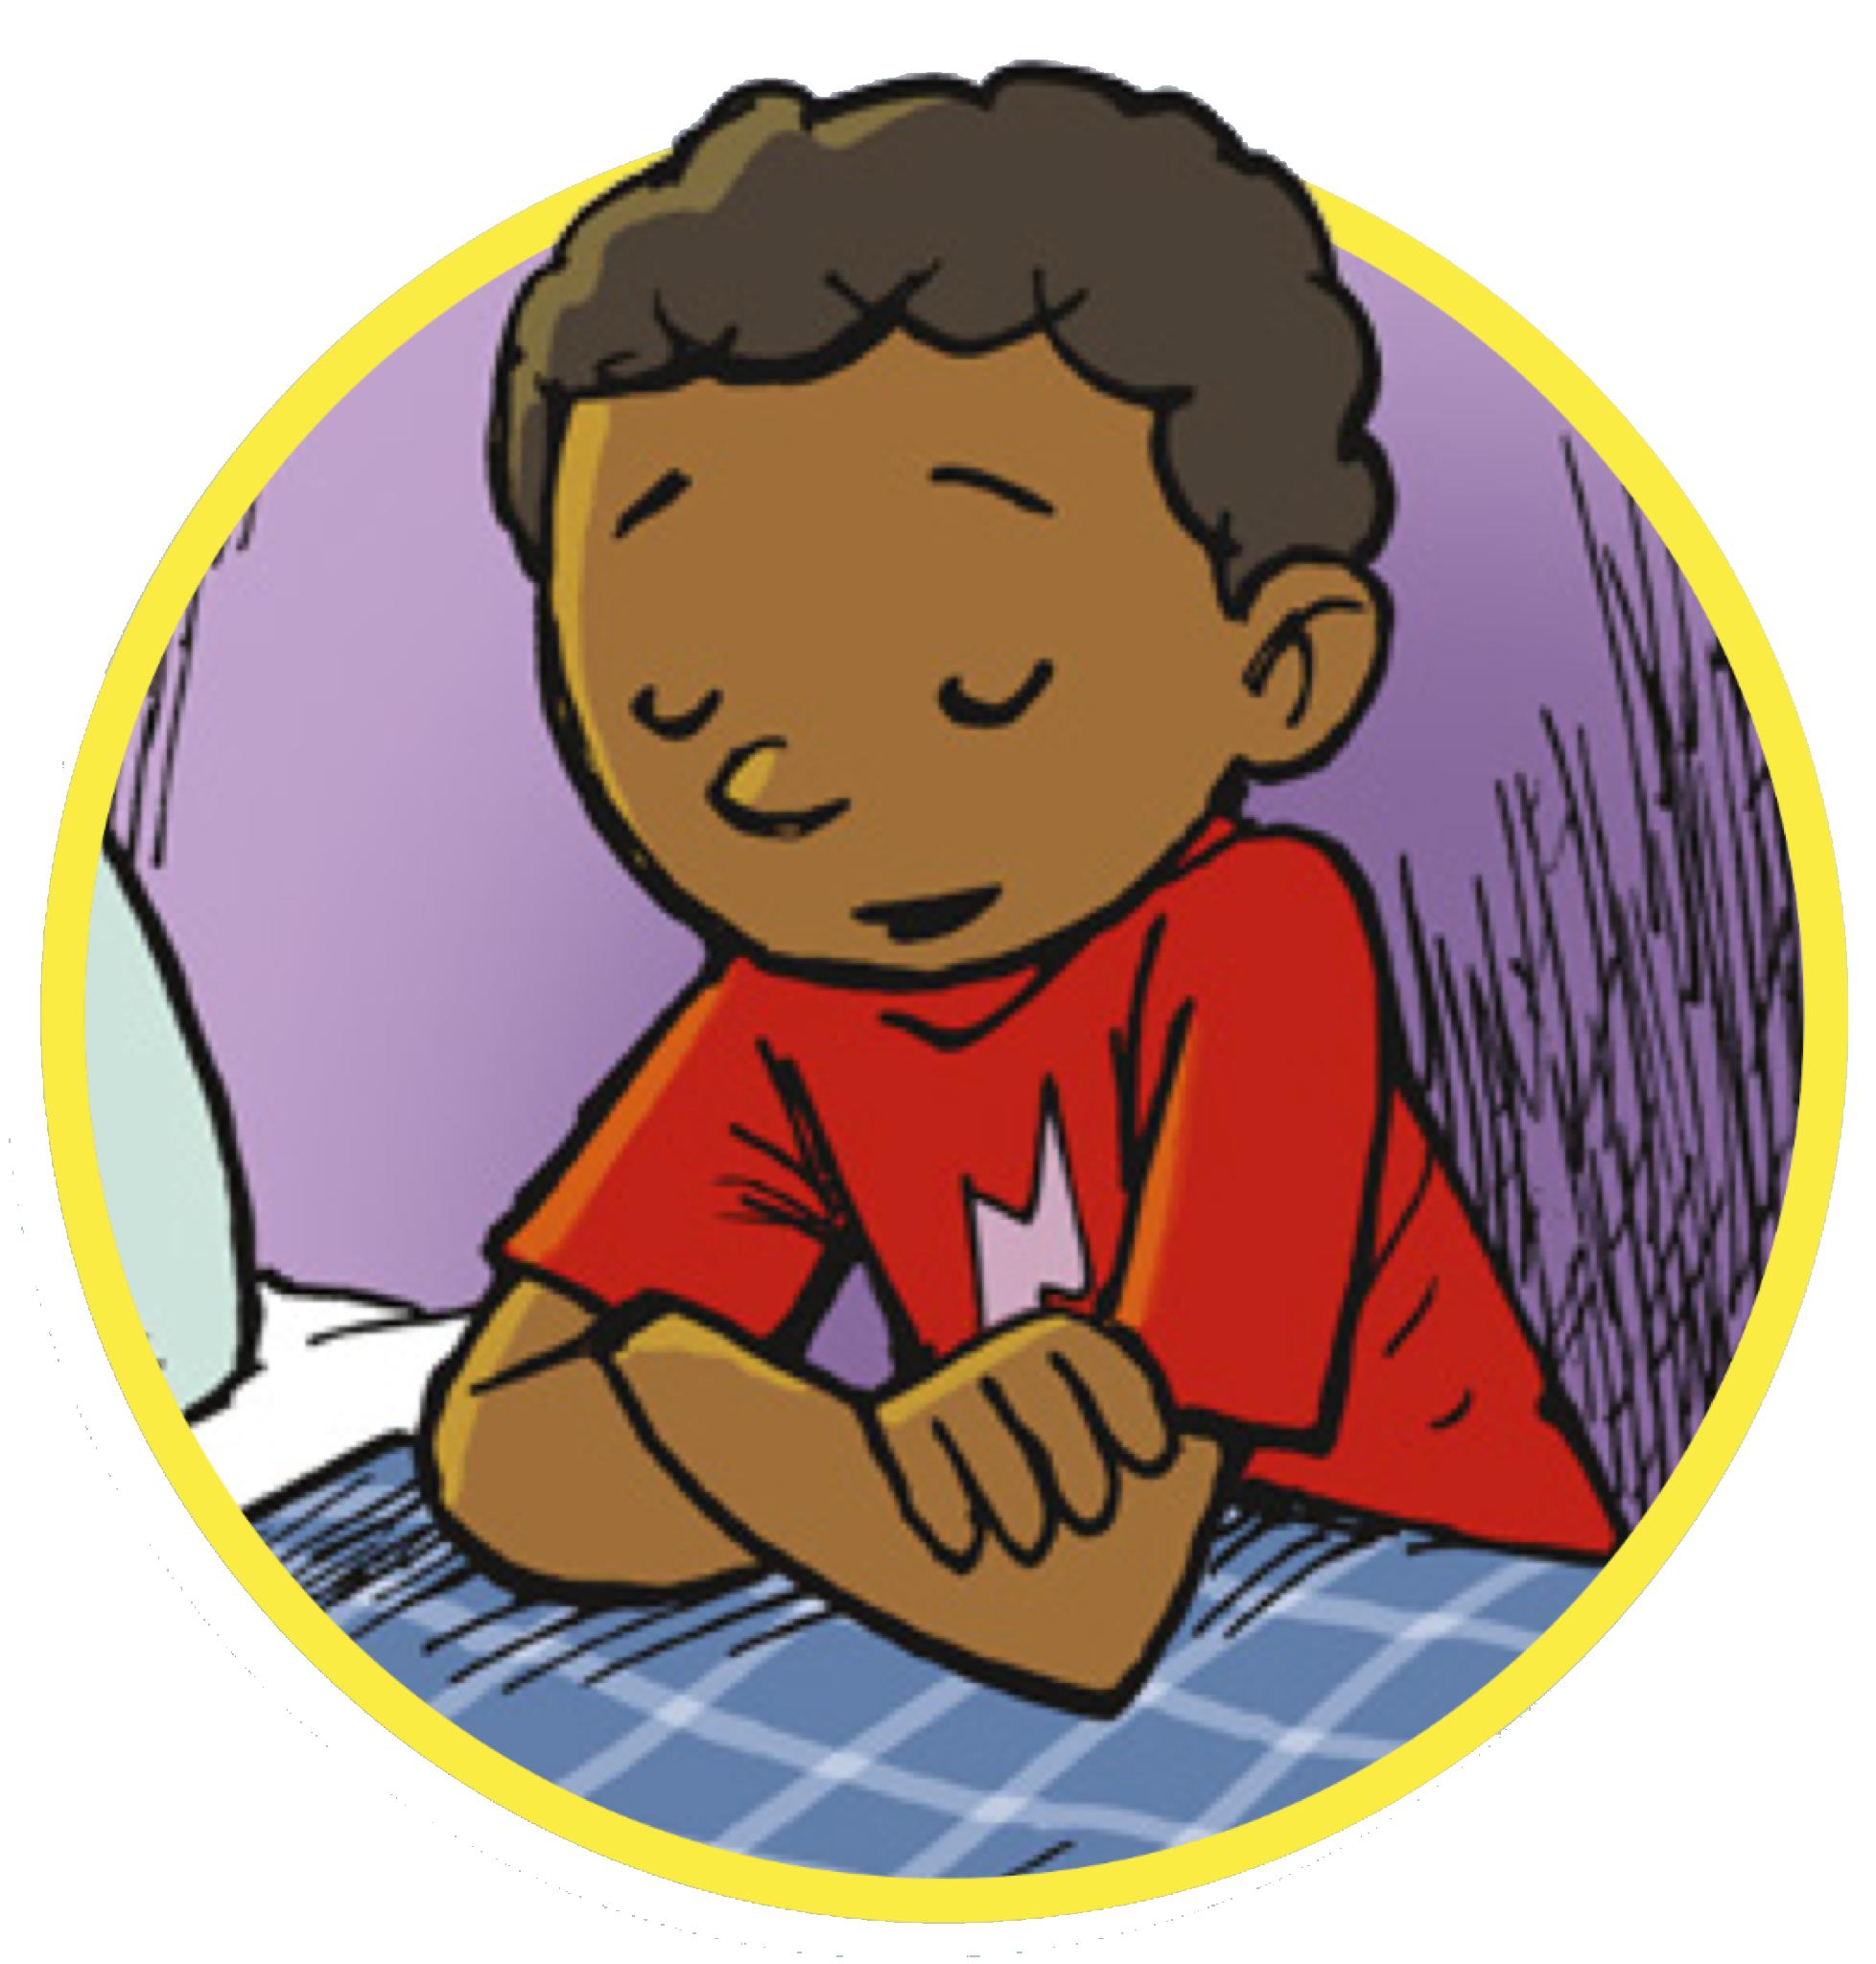 Child choosing clipart clipart royalty free library Prayer: Clipart - Teaching Children clipart royalty free library